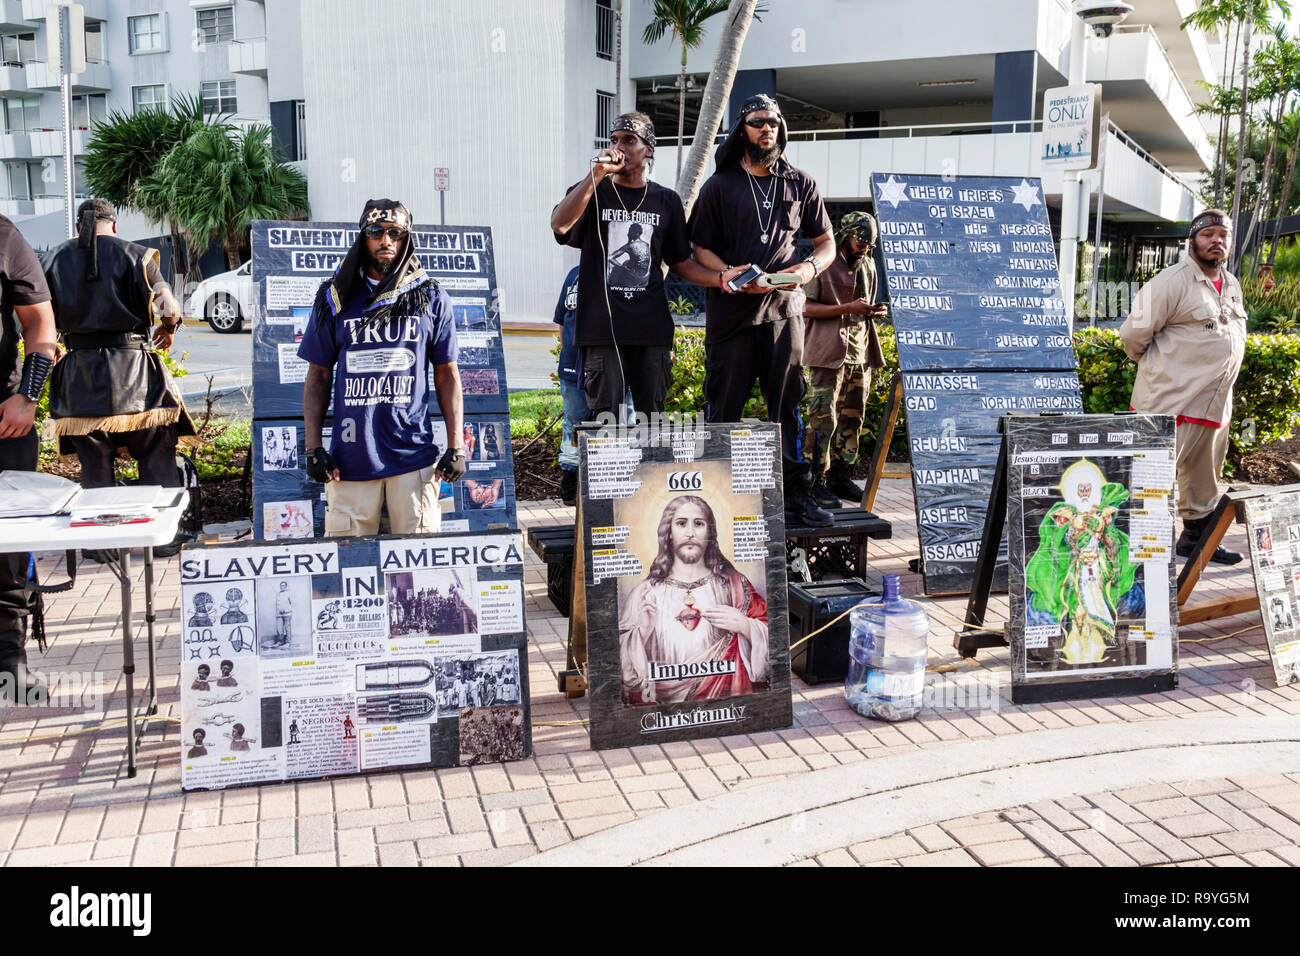 Miami Beach Florida Lummus Park free speech speaking speaker ISPUK Israelite School of Universal Practical Knowledge Black man signs - Stock Image